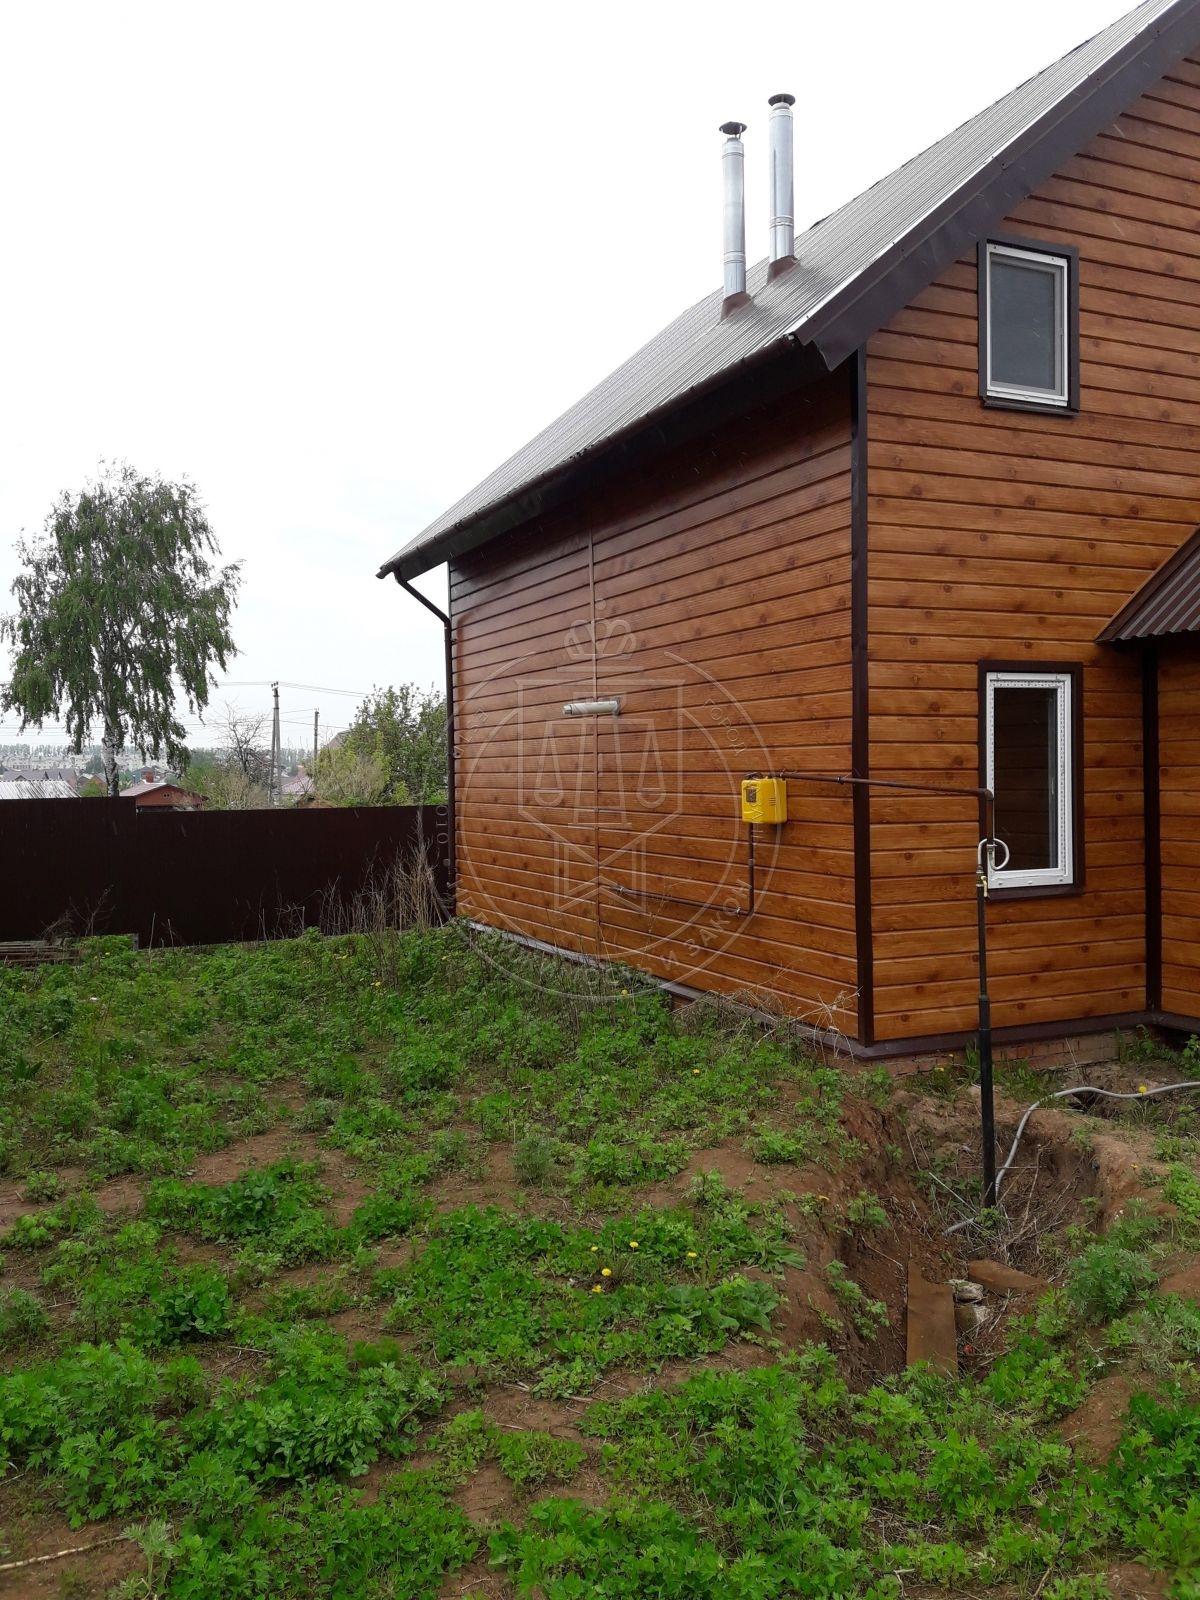 Продажа  дома п. Куюки, ул Центральная, 100.0 м² (миниатюра №5)